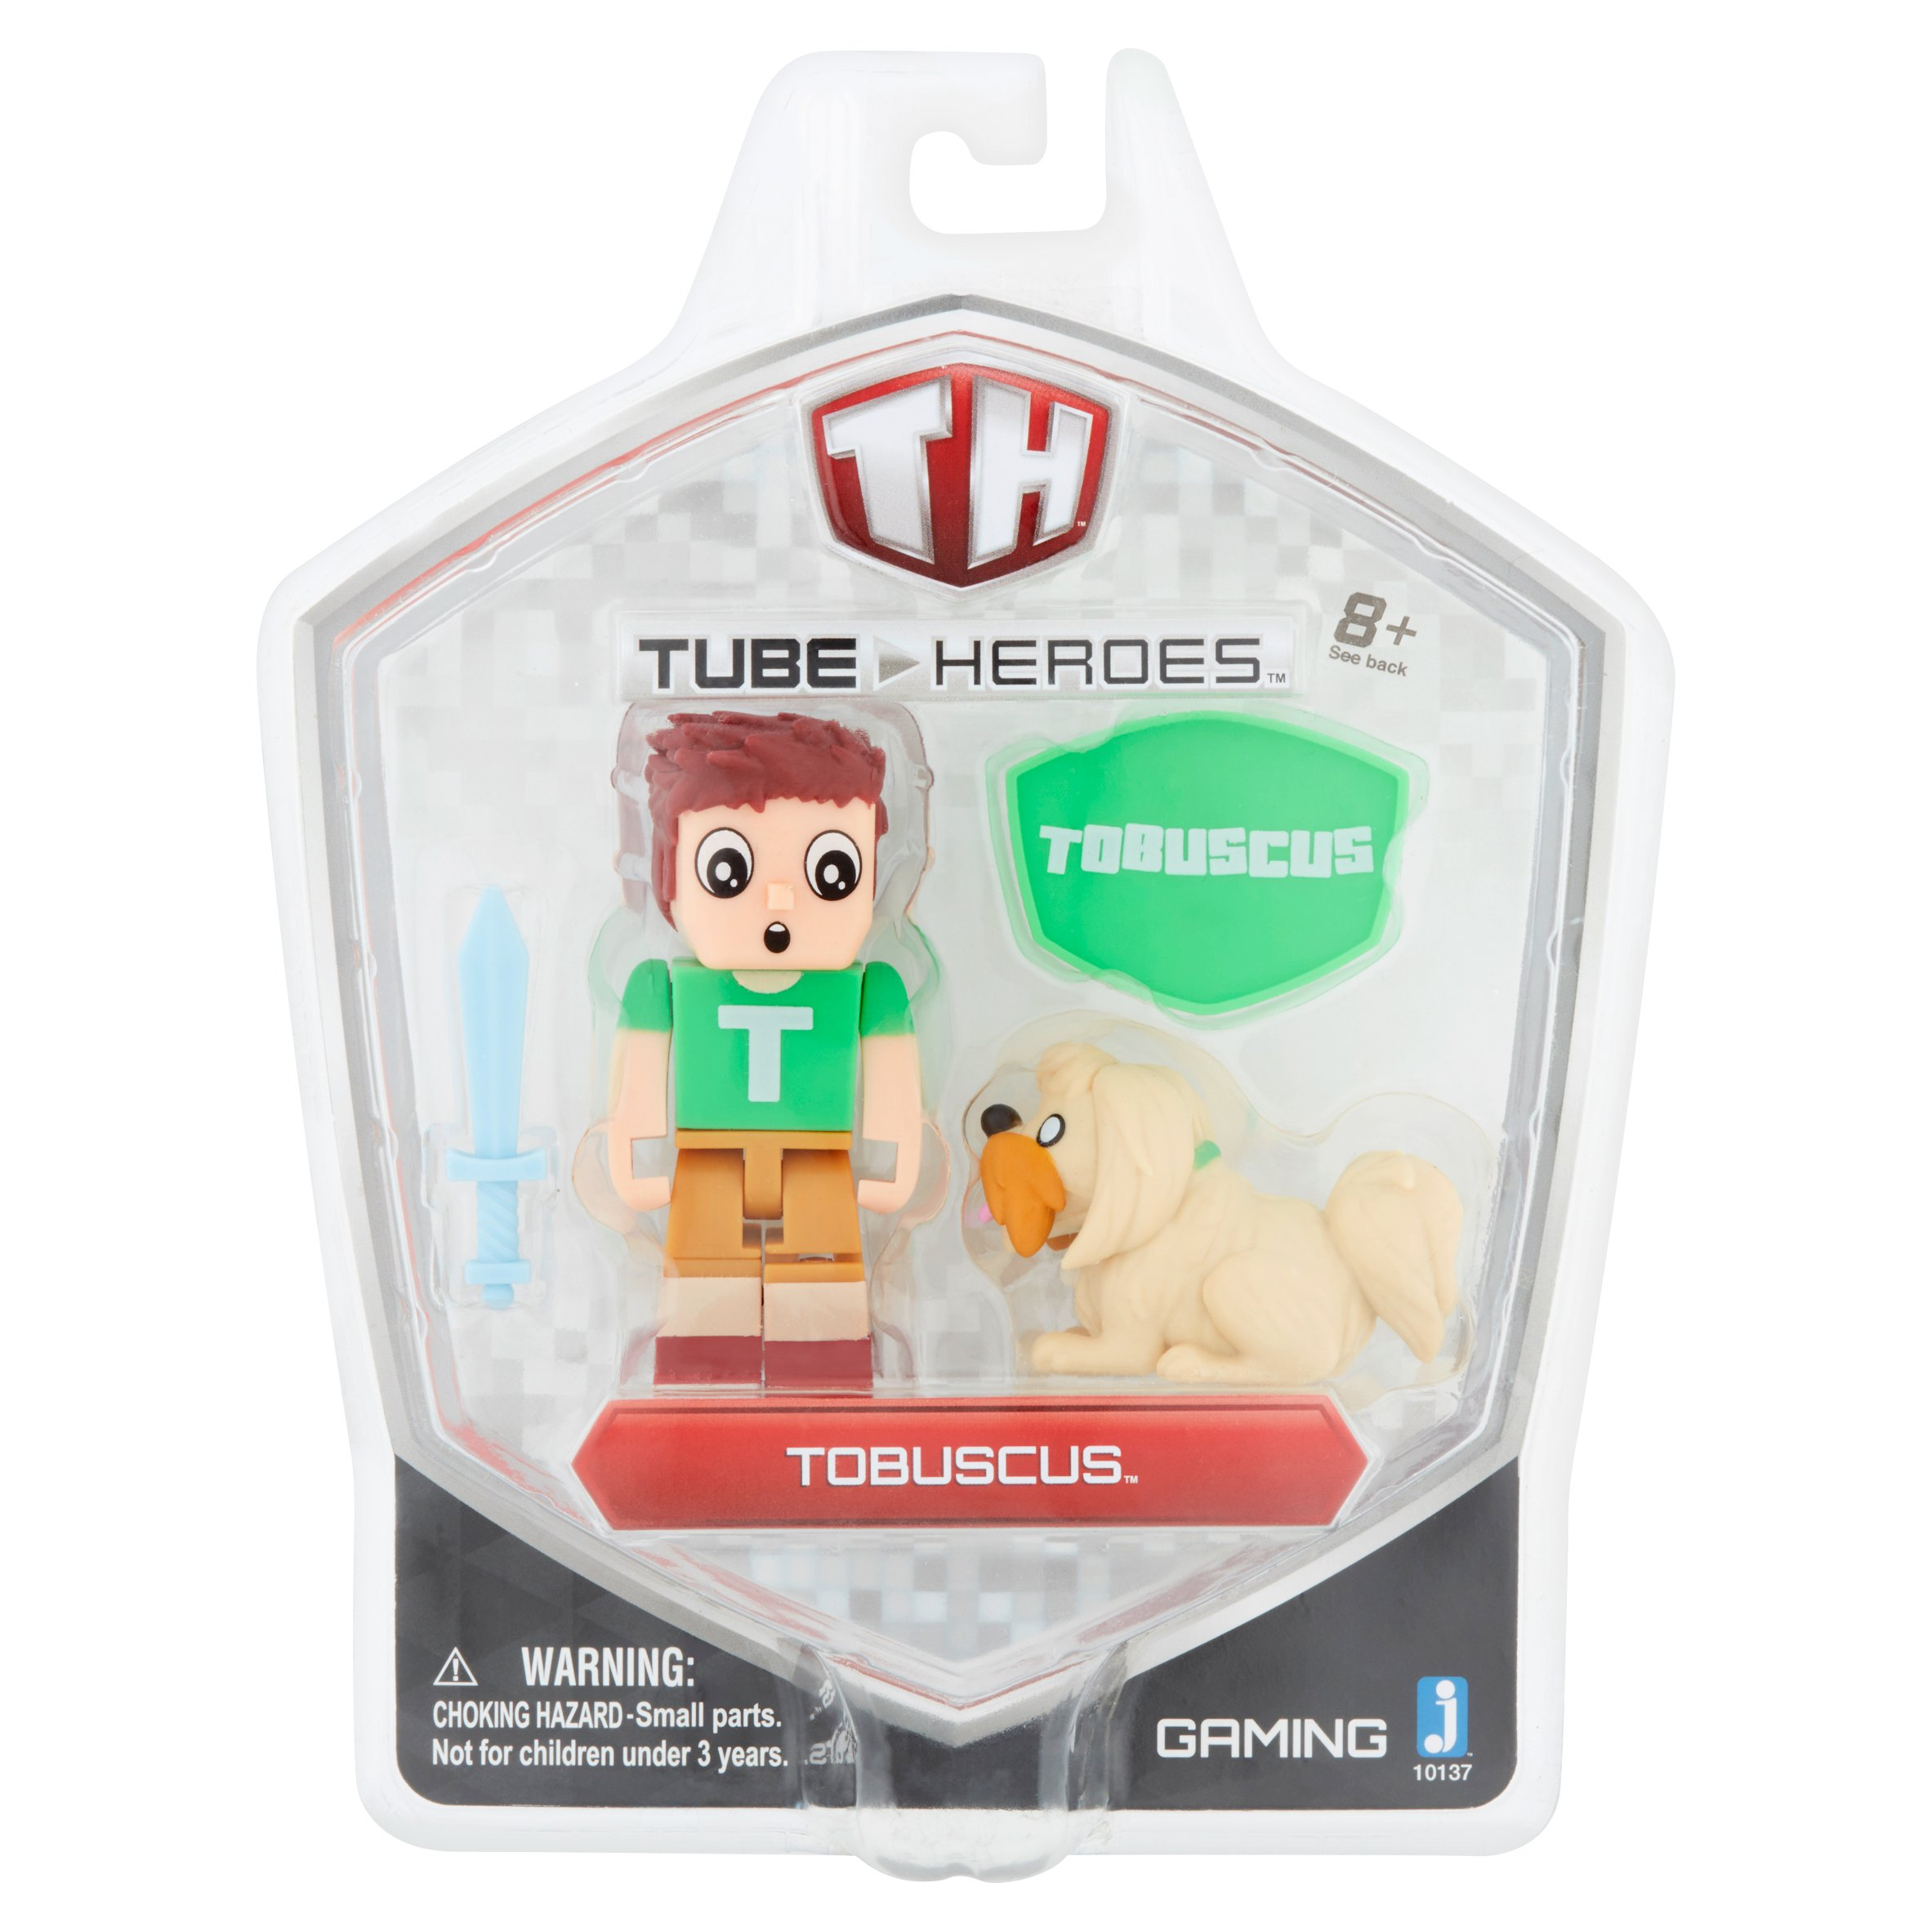 Tube Heroes Tobuscus Toy Figure 8+